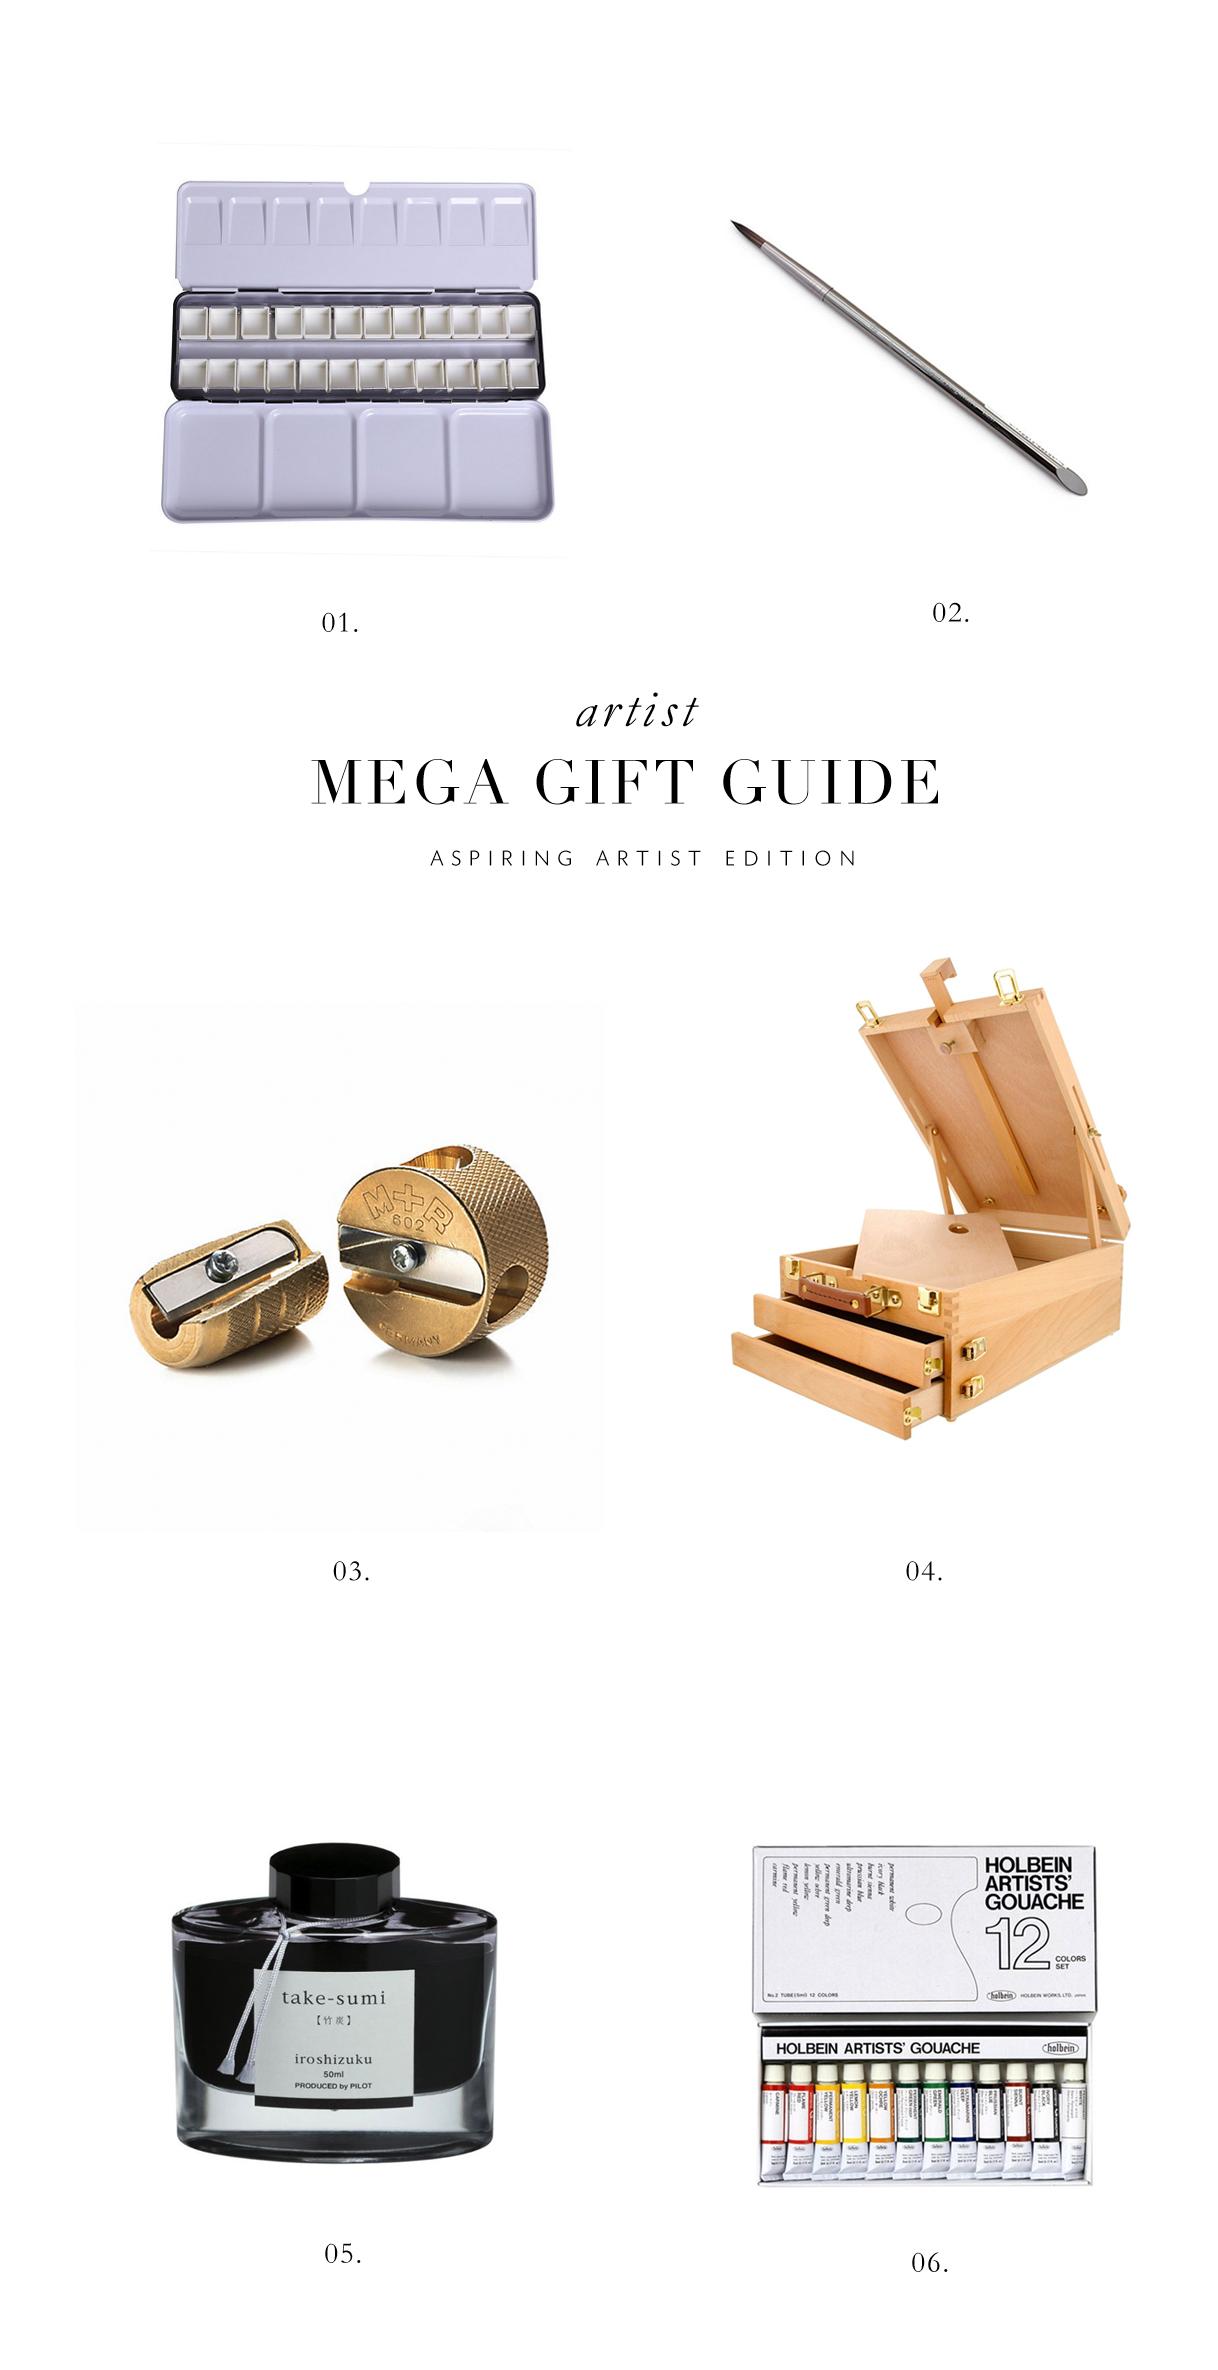 aspiring artist gift guide via besottedblog